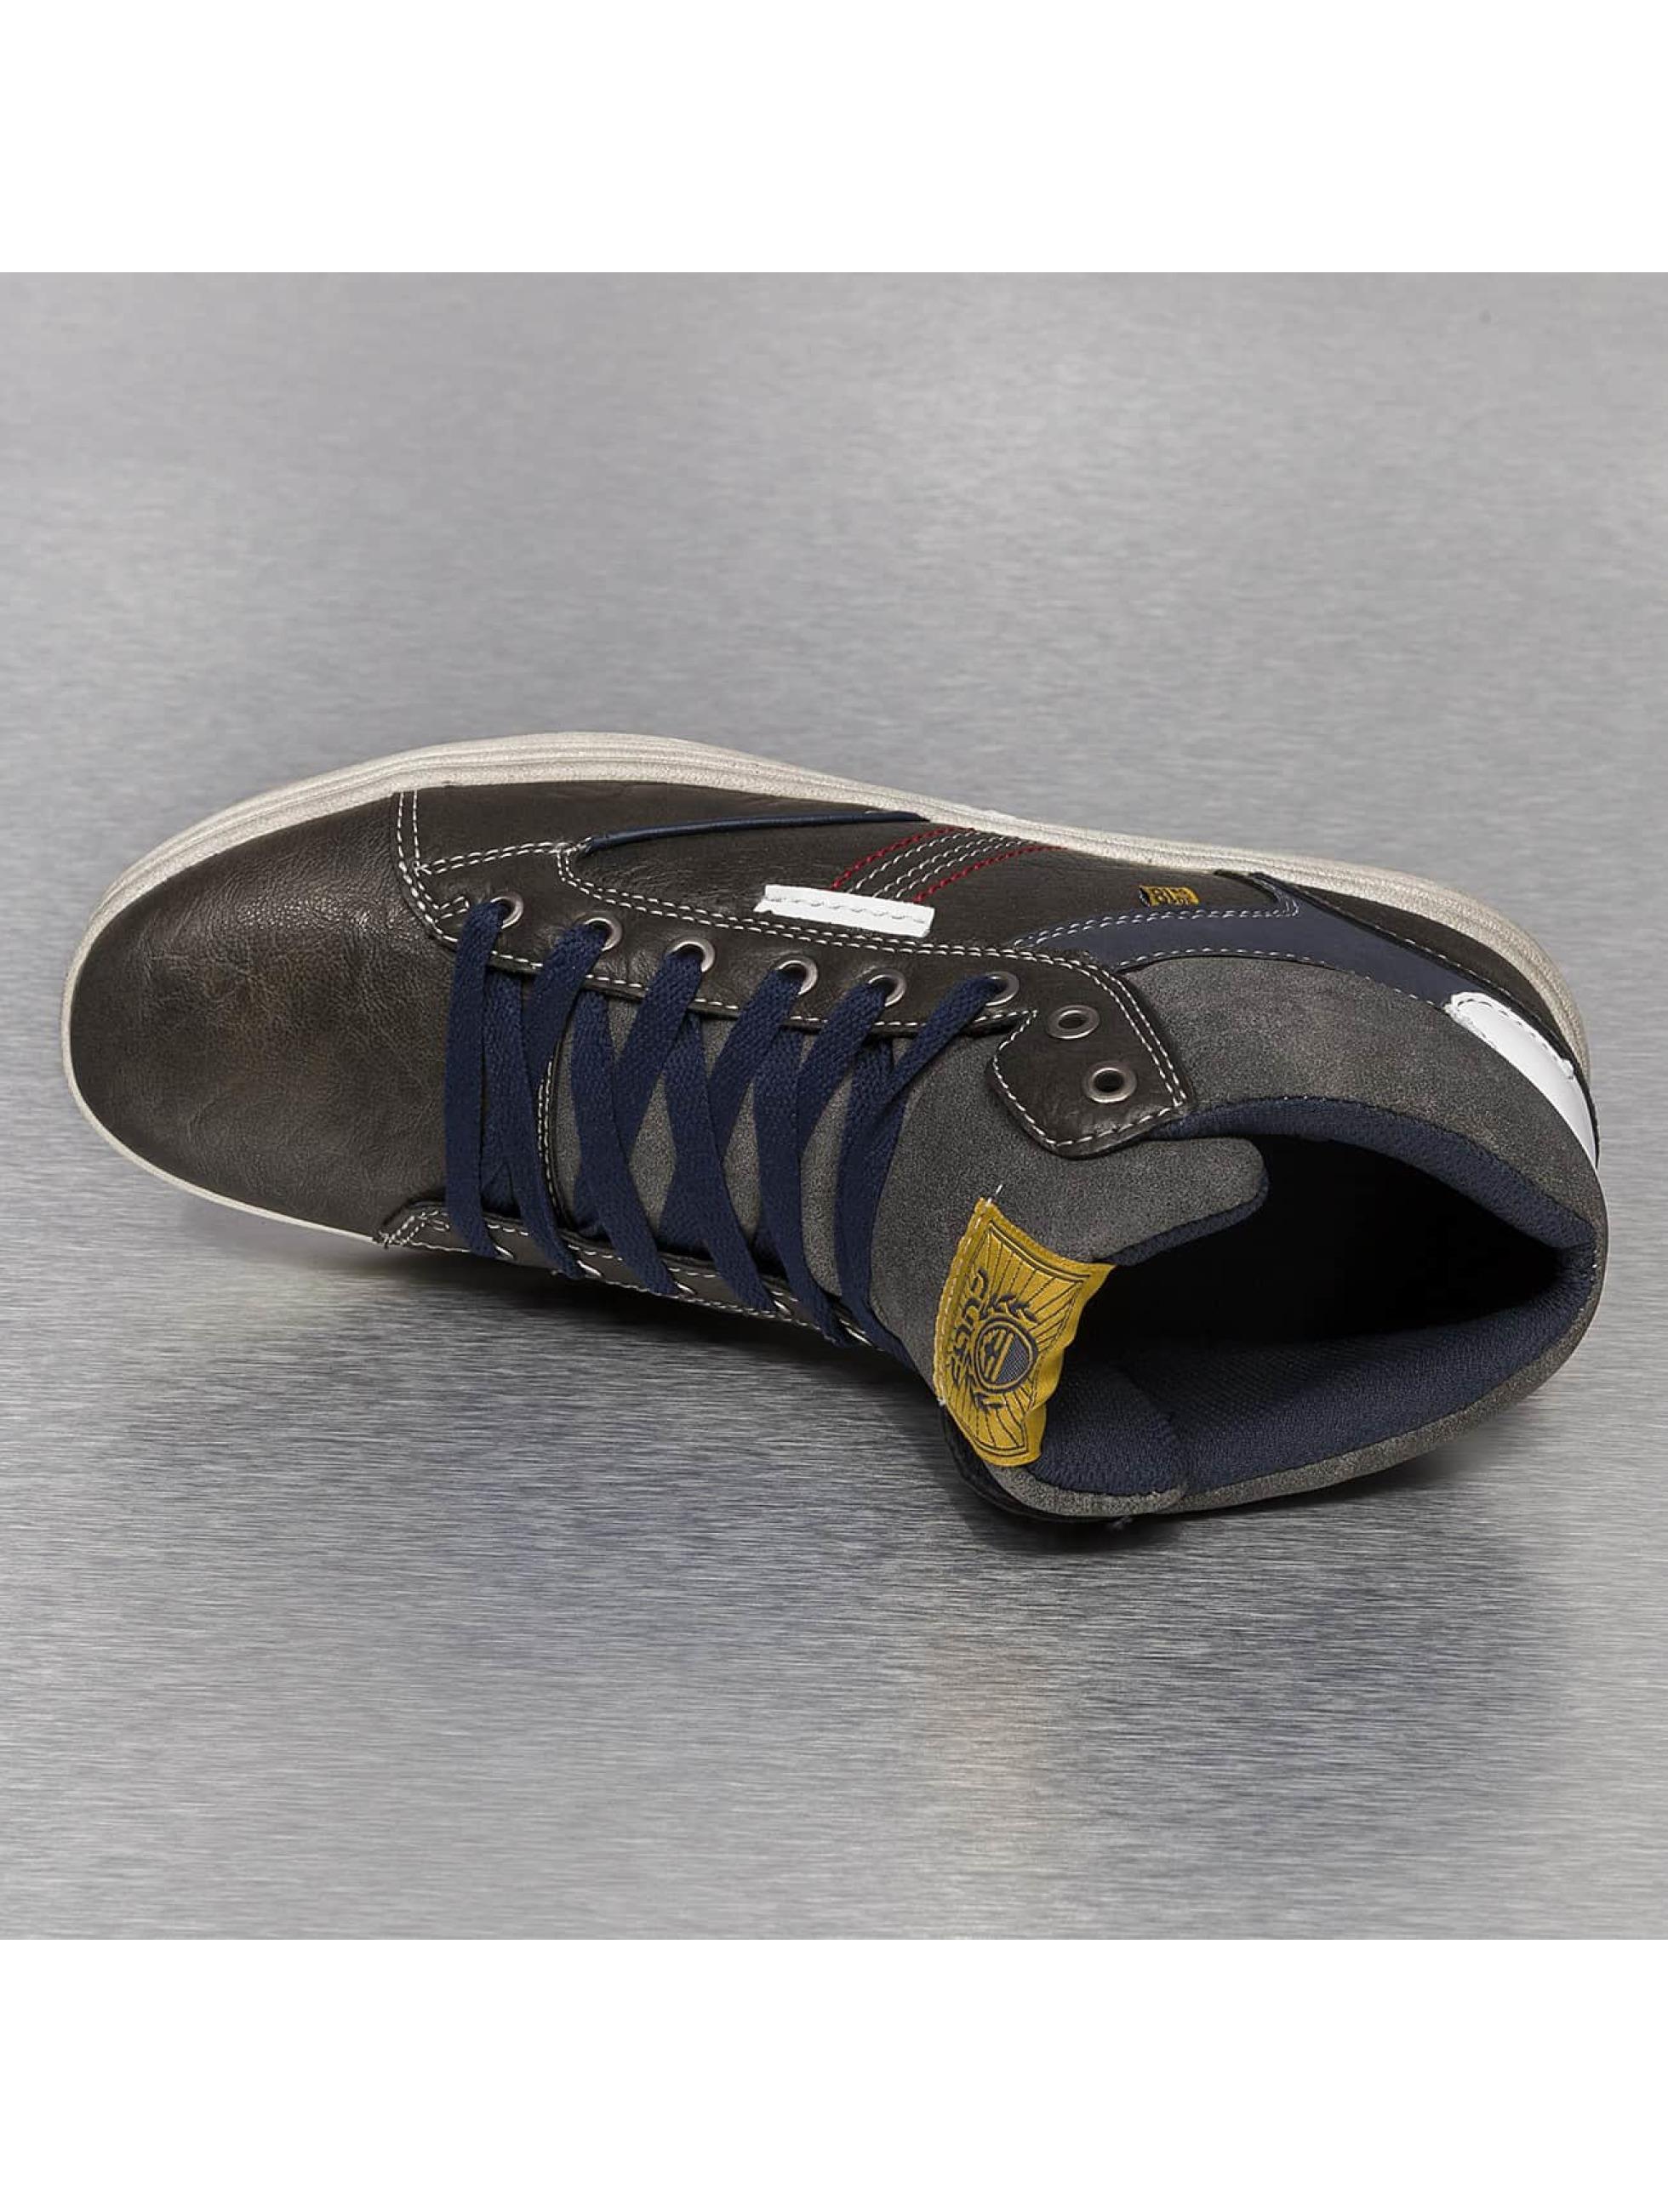 New York Style Sneakers Kairo grey